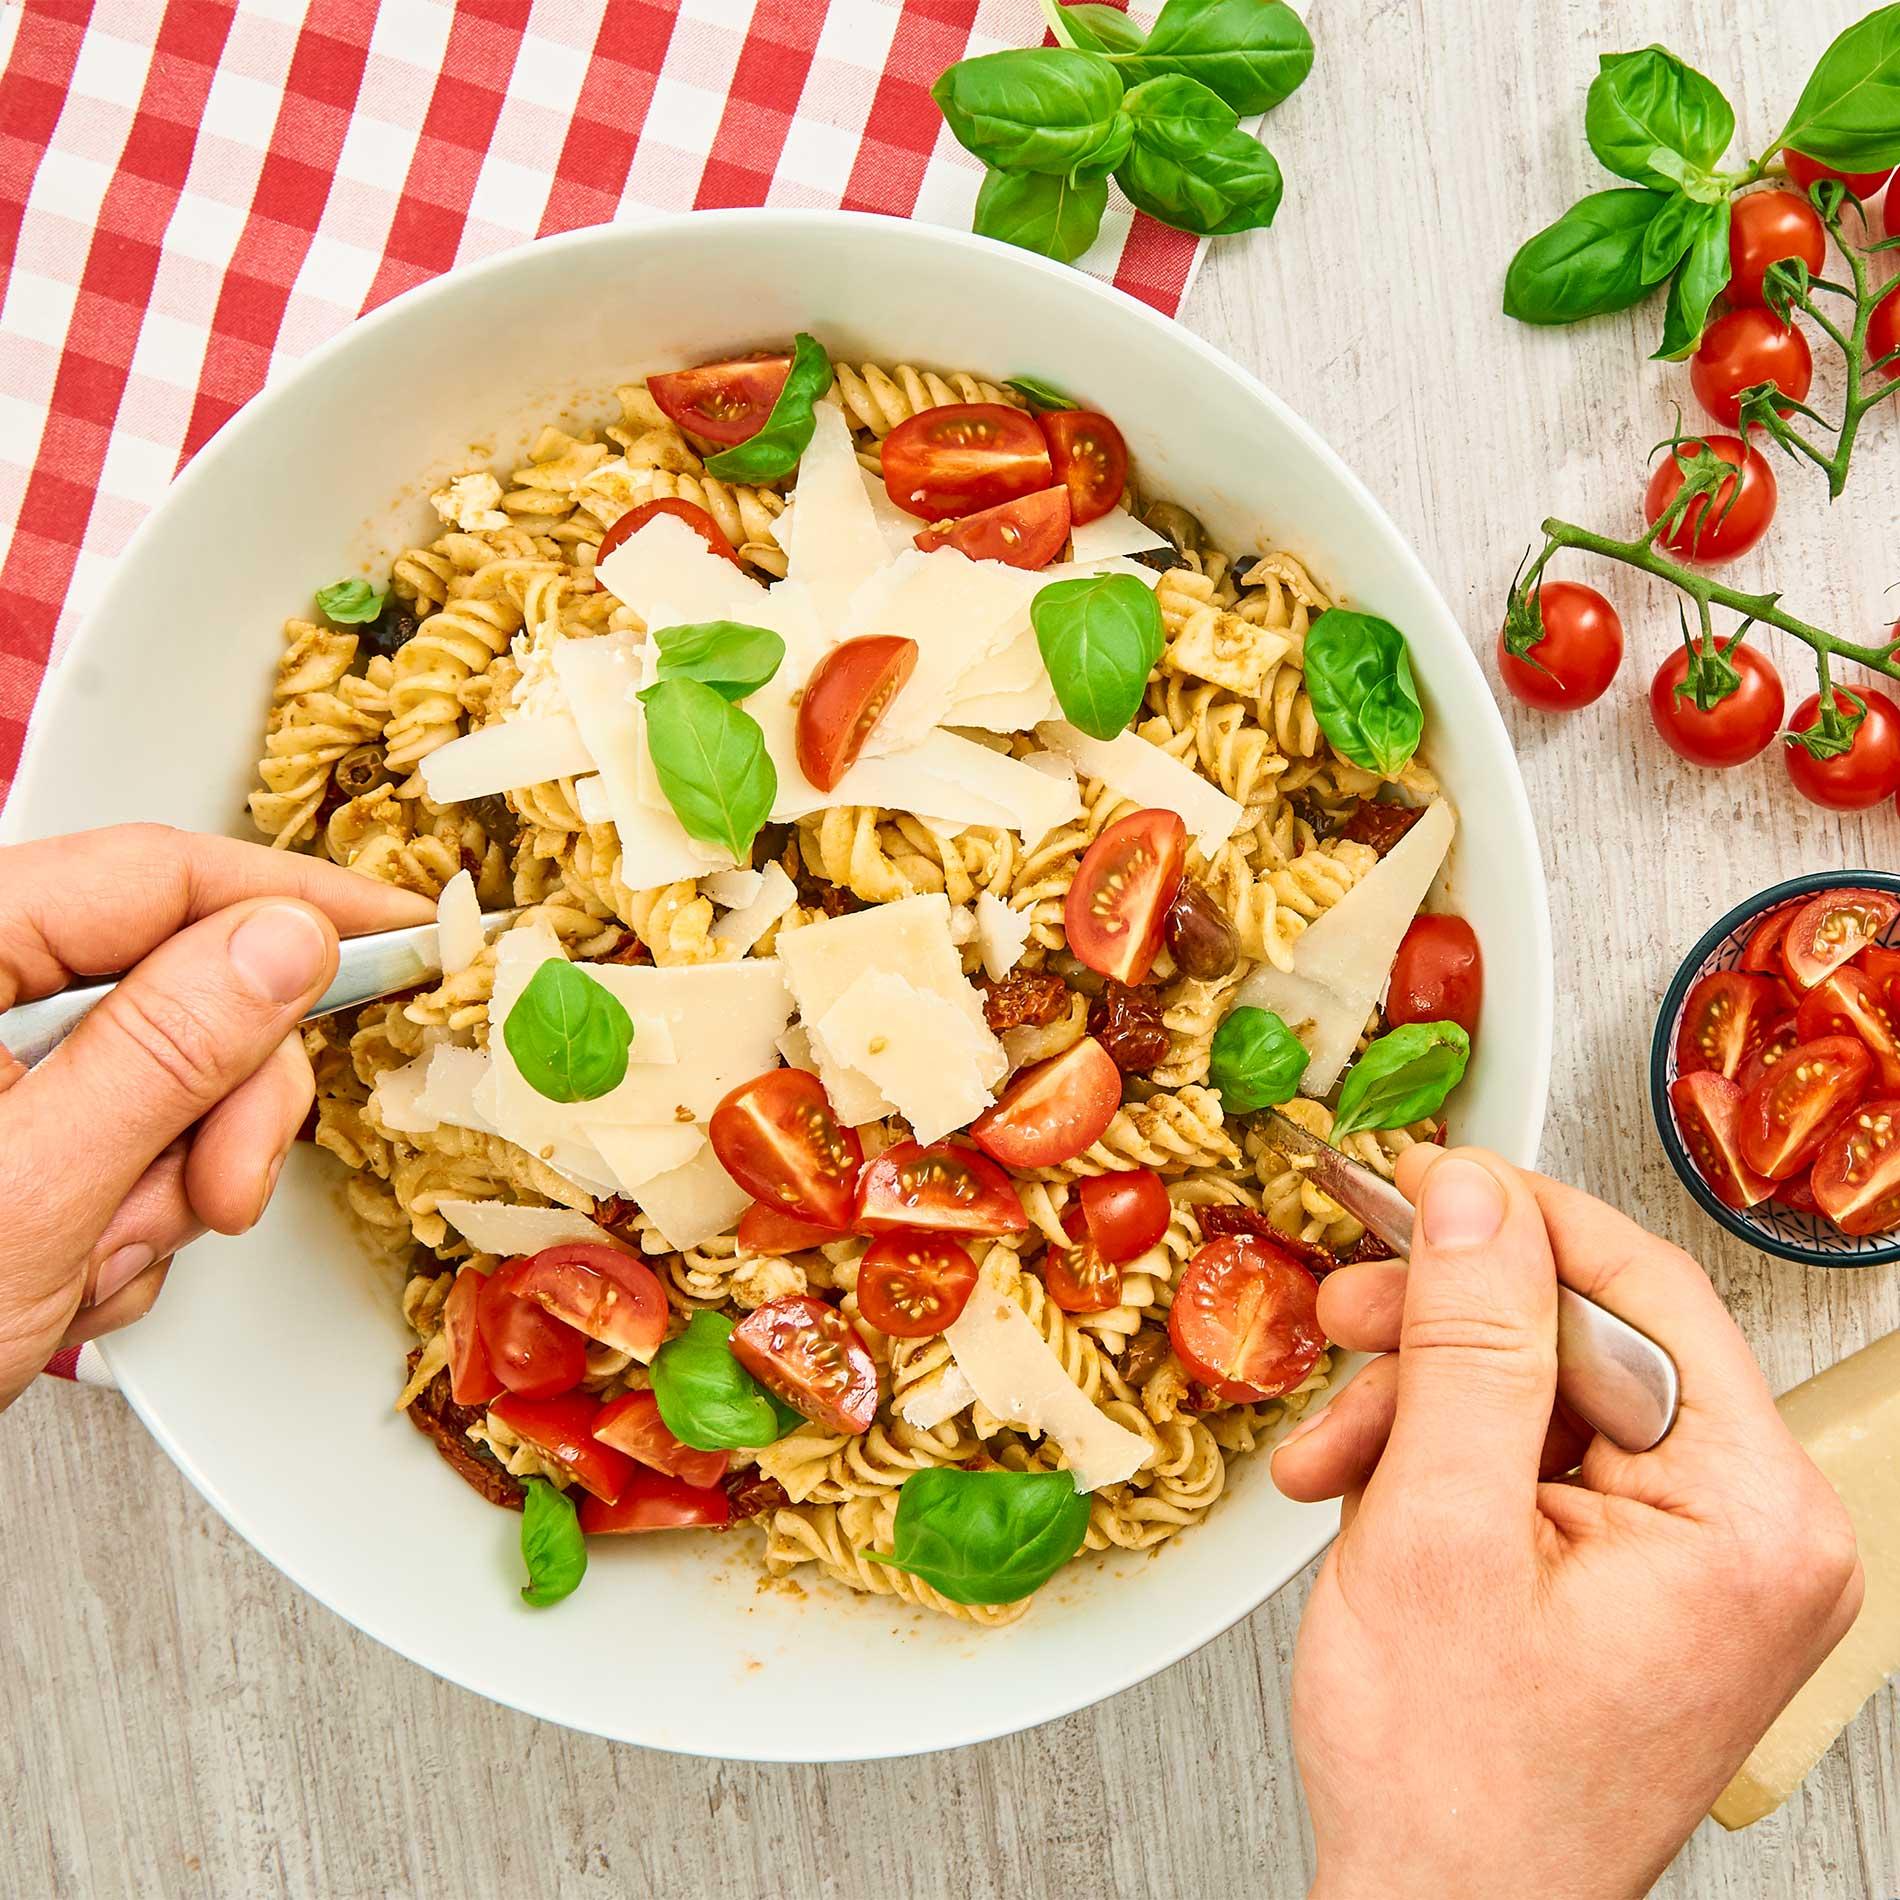 Italienischer Nudelsalat – Blitz-Rezept mit Pesto